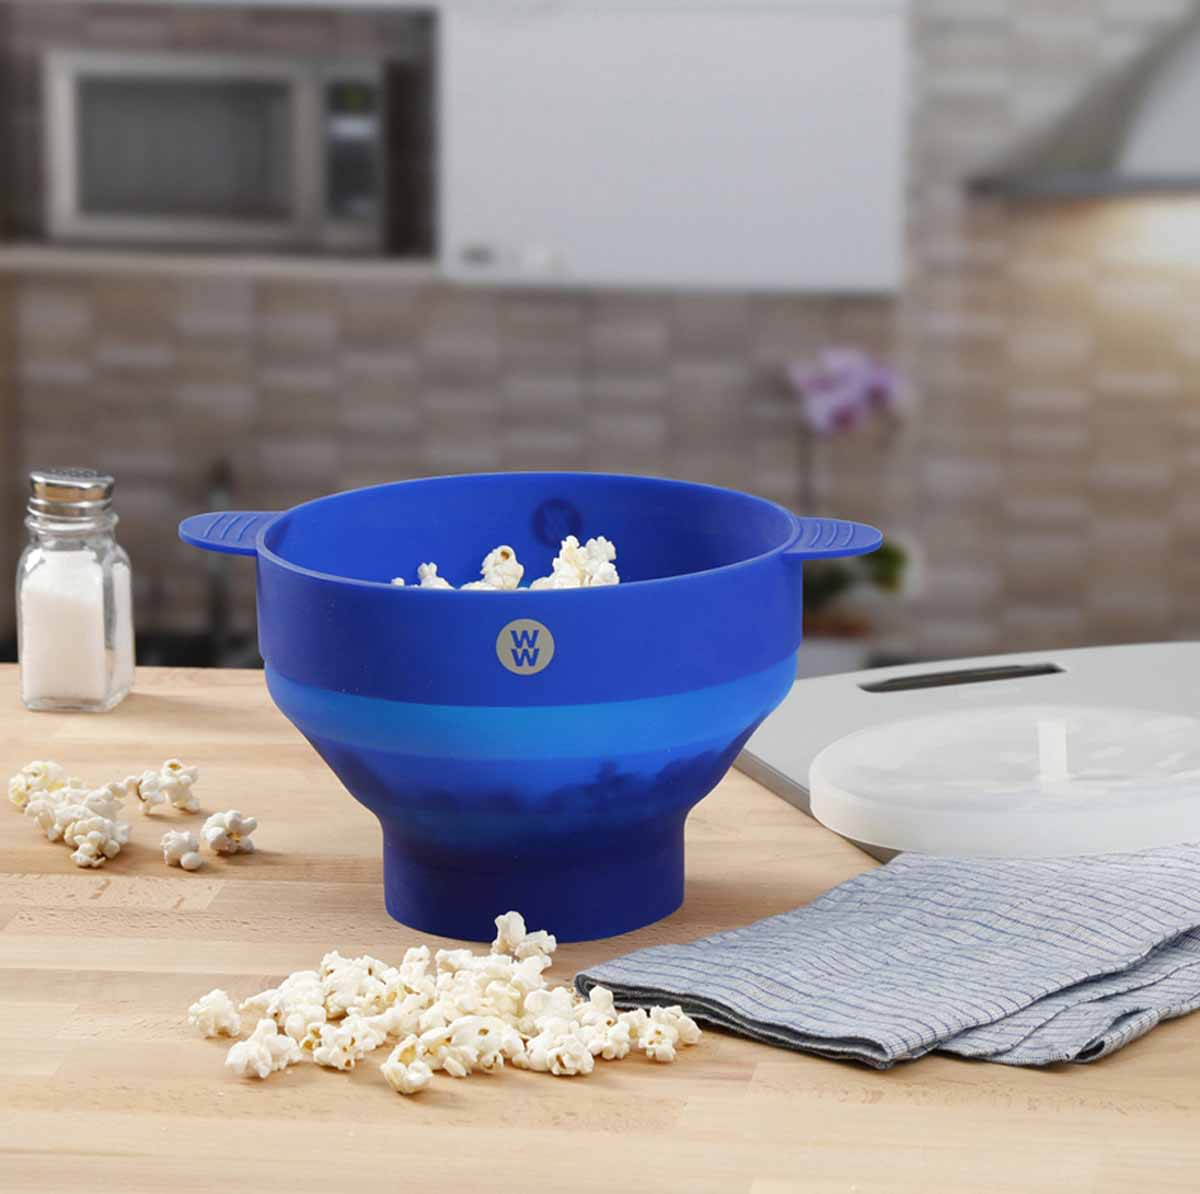 Silicone Microwave Popcorn Popper - alternate view